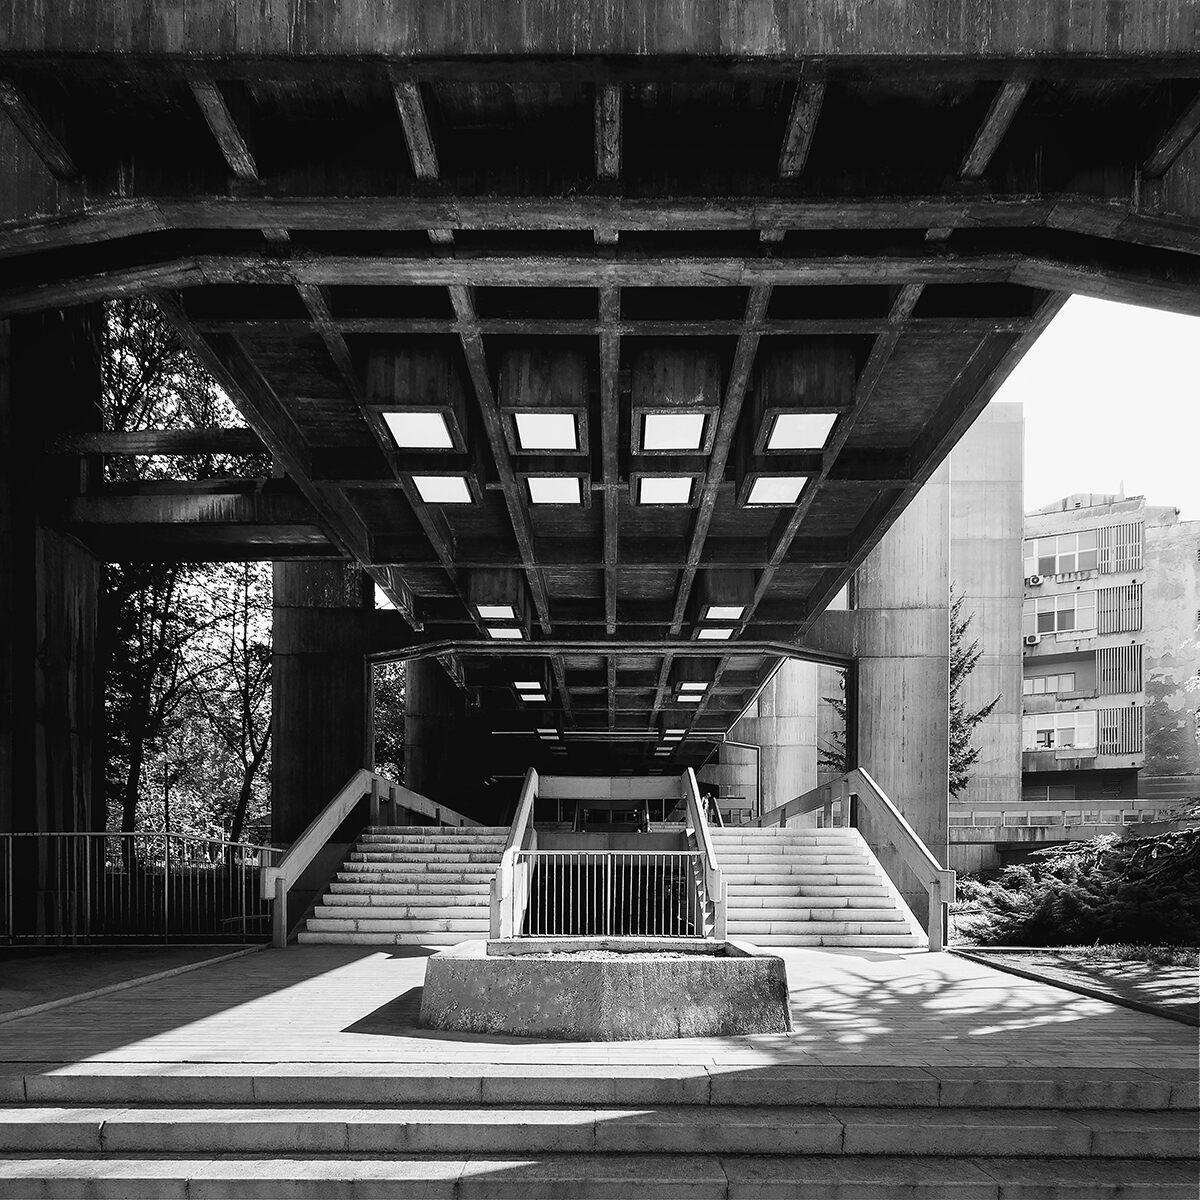 Urban Planning Institute, architect Branislav Jovin, 1970.